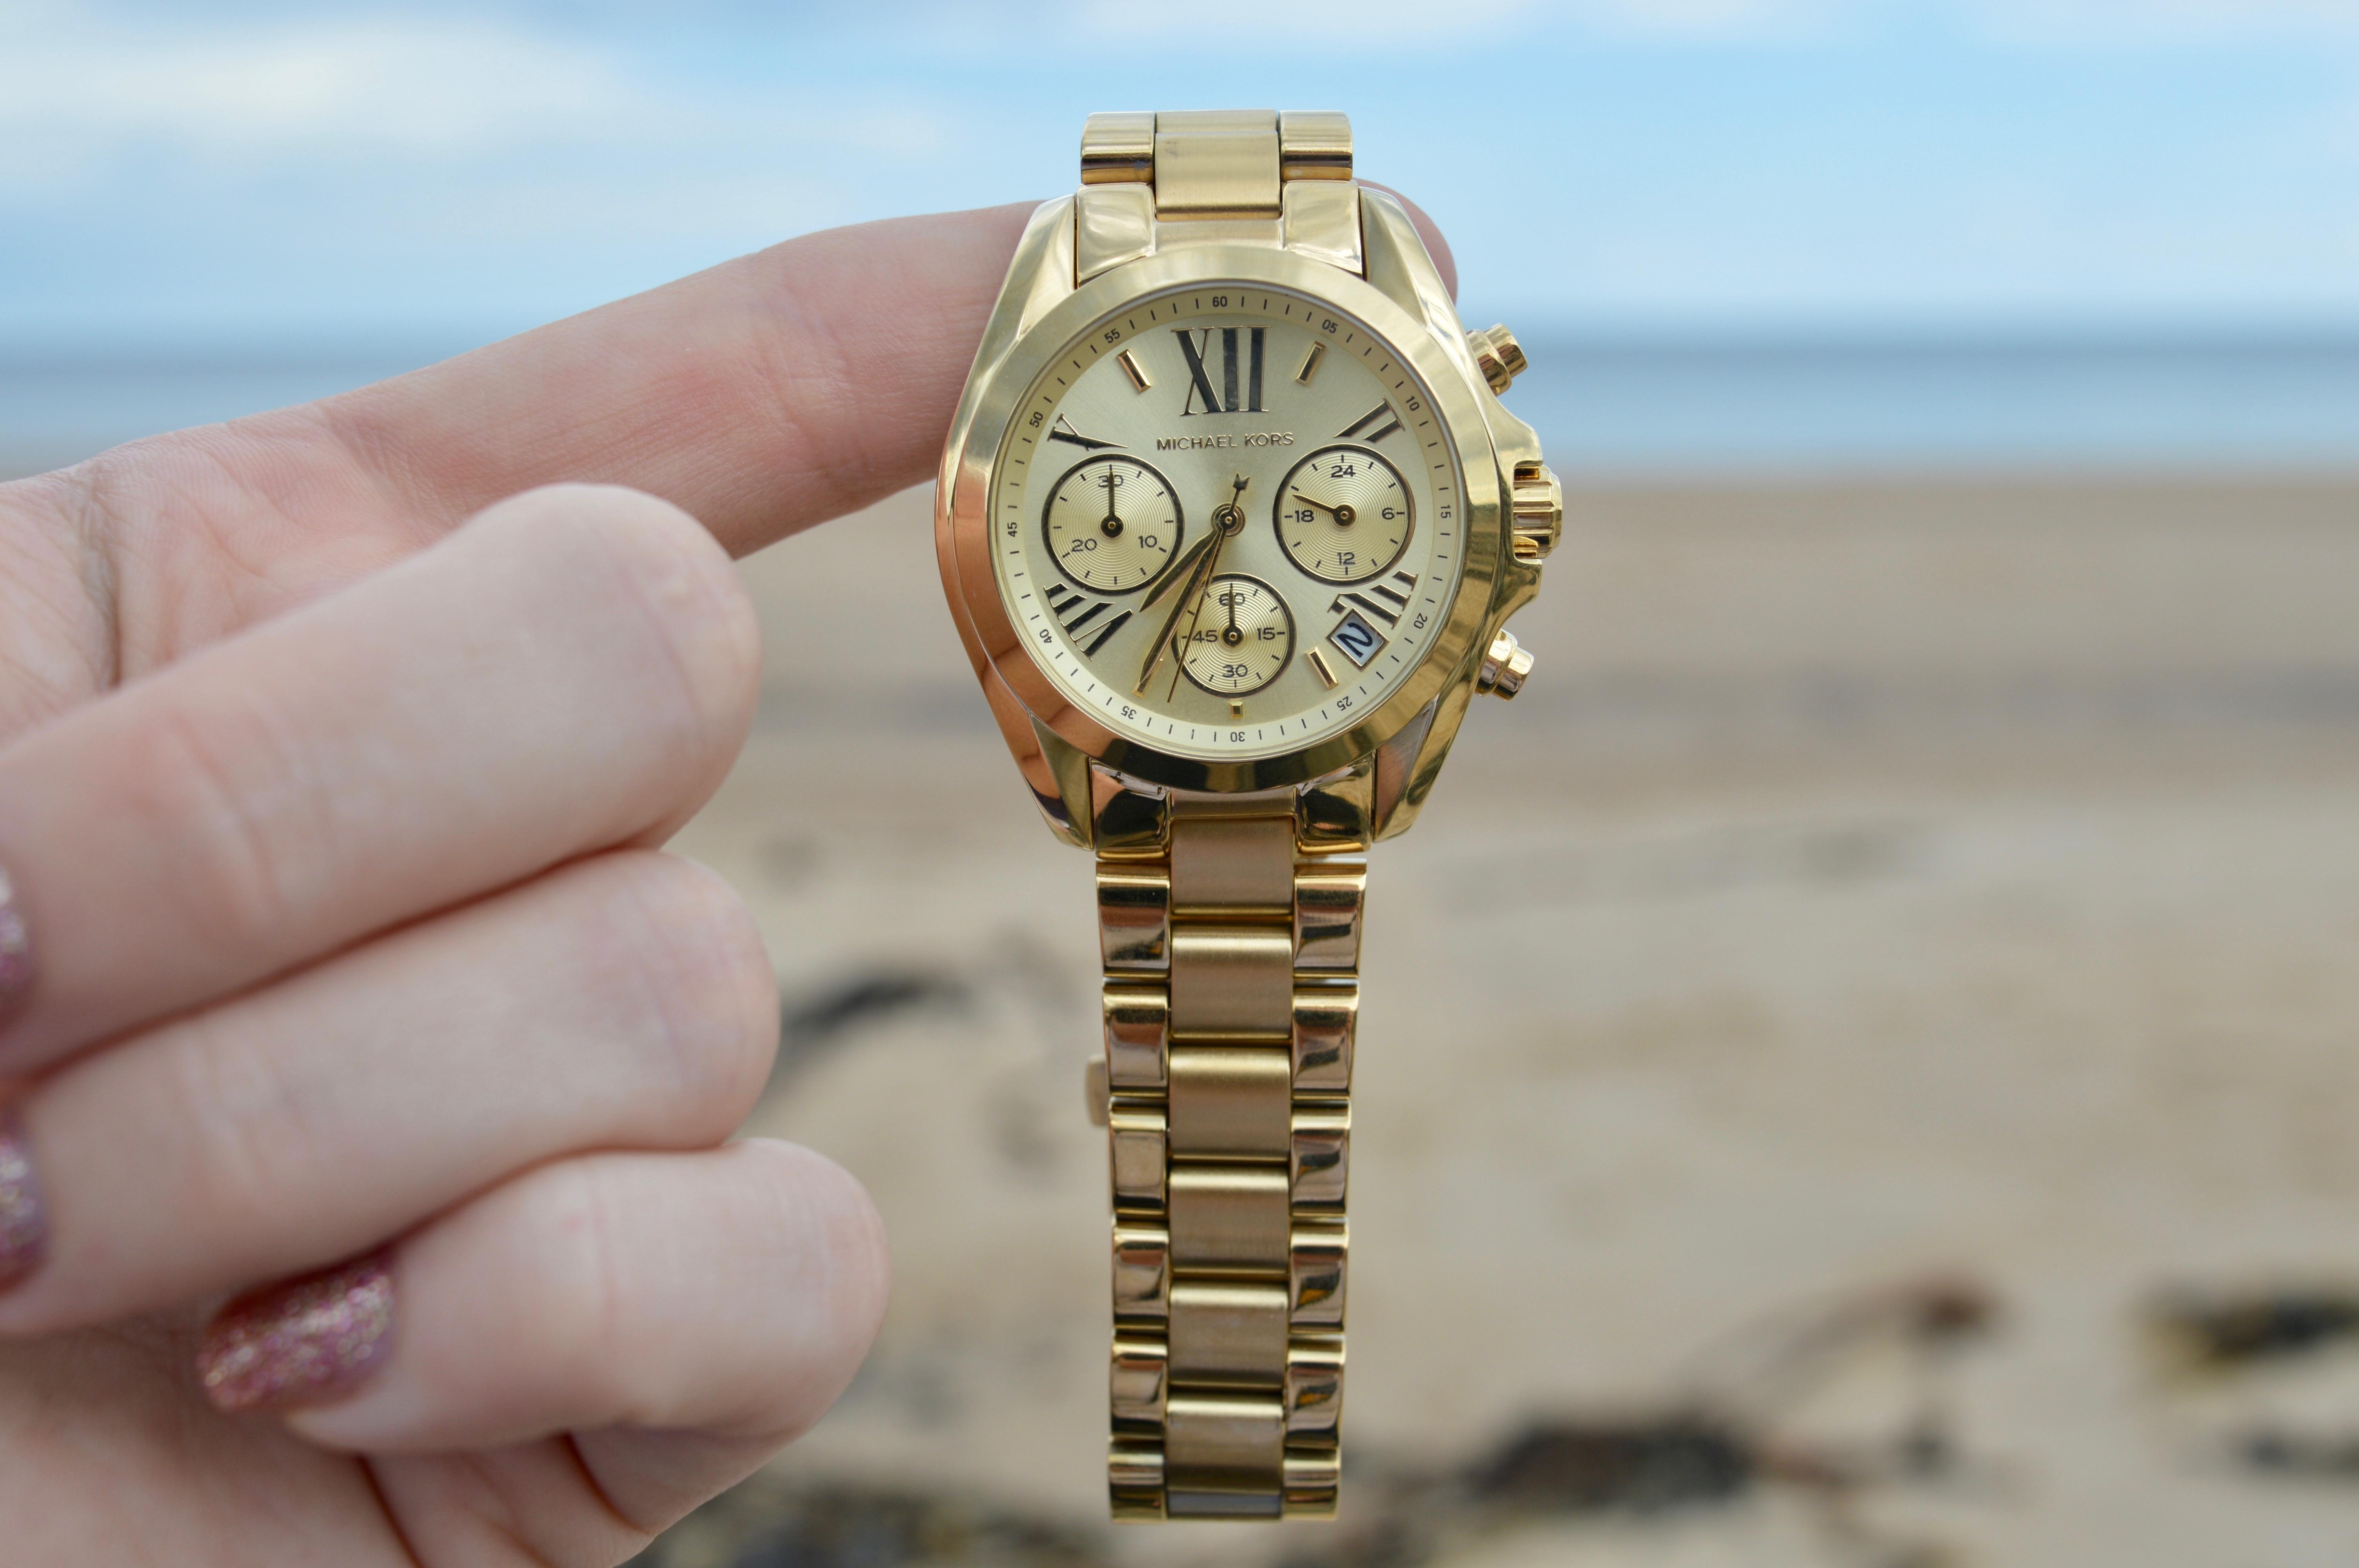 beach-plus watches-michael-kors-gold-watch-elle-blonde-luxury-lifestyle-blog